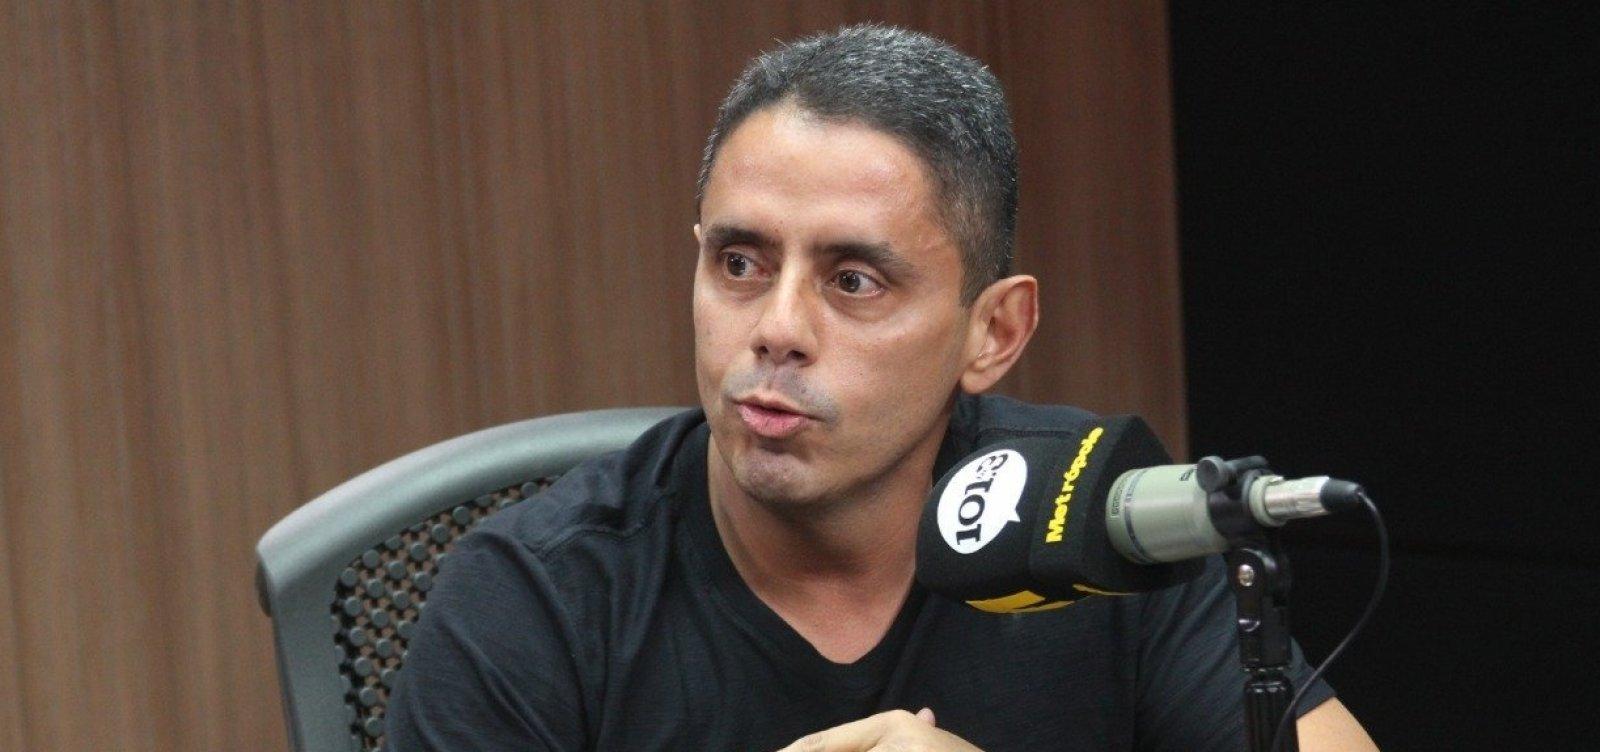 Presidência da OAB-BA: Gamil anuncia chapa com Larissa Camandaroba como vice